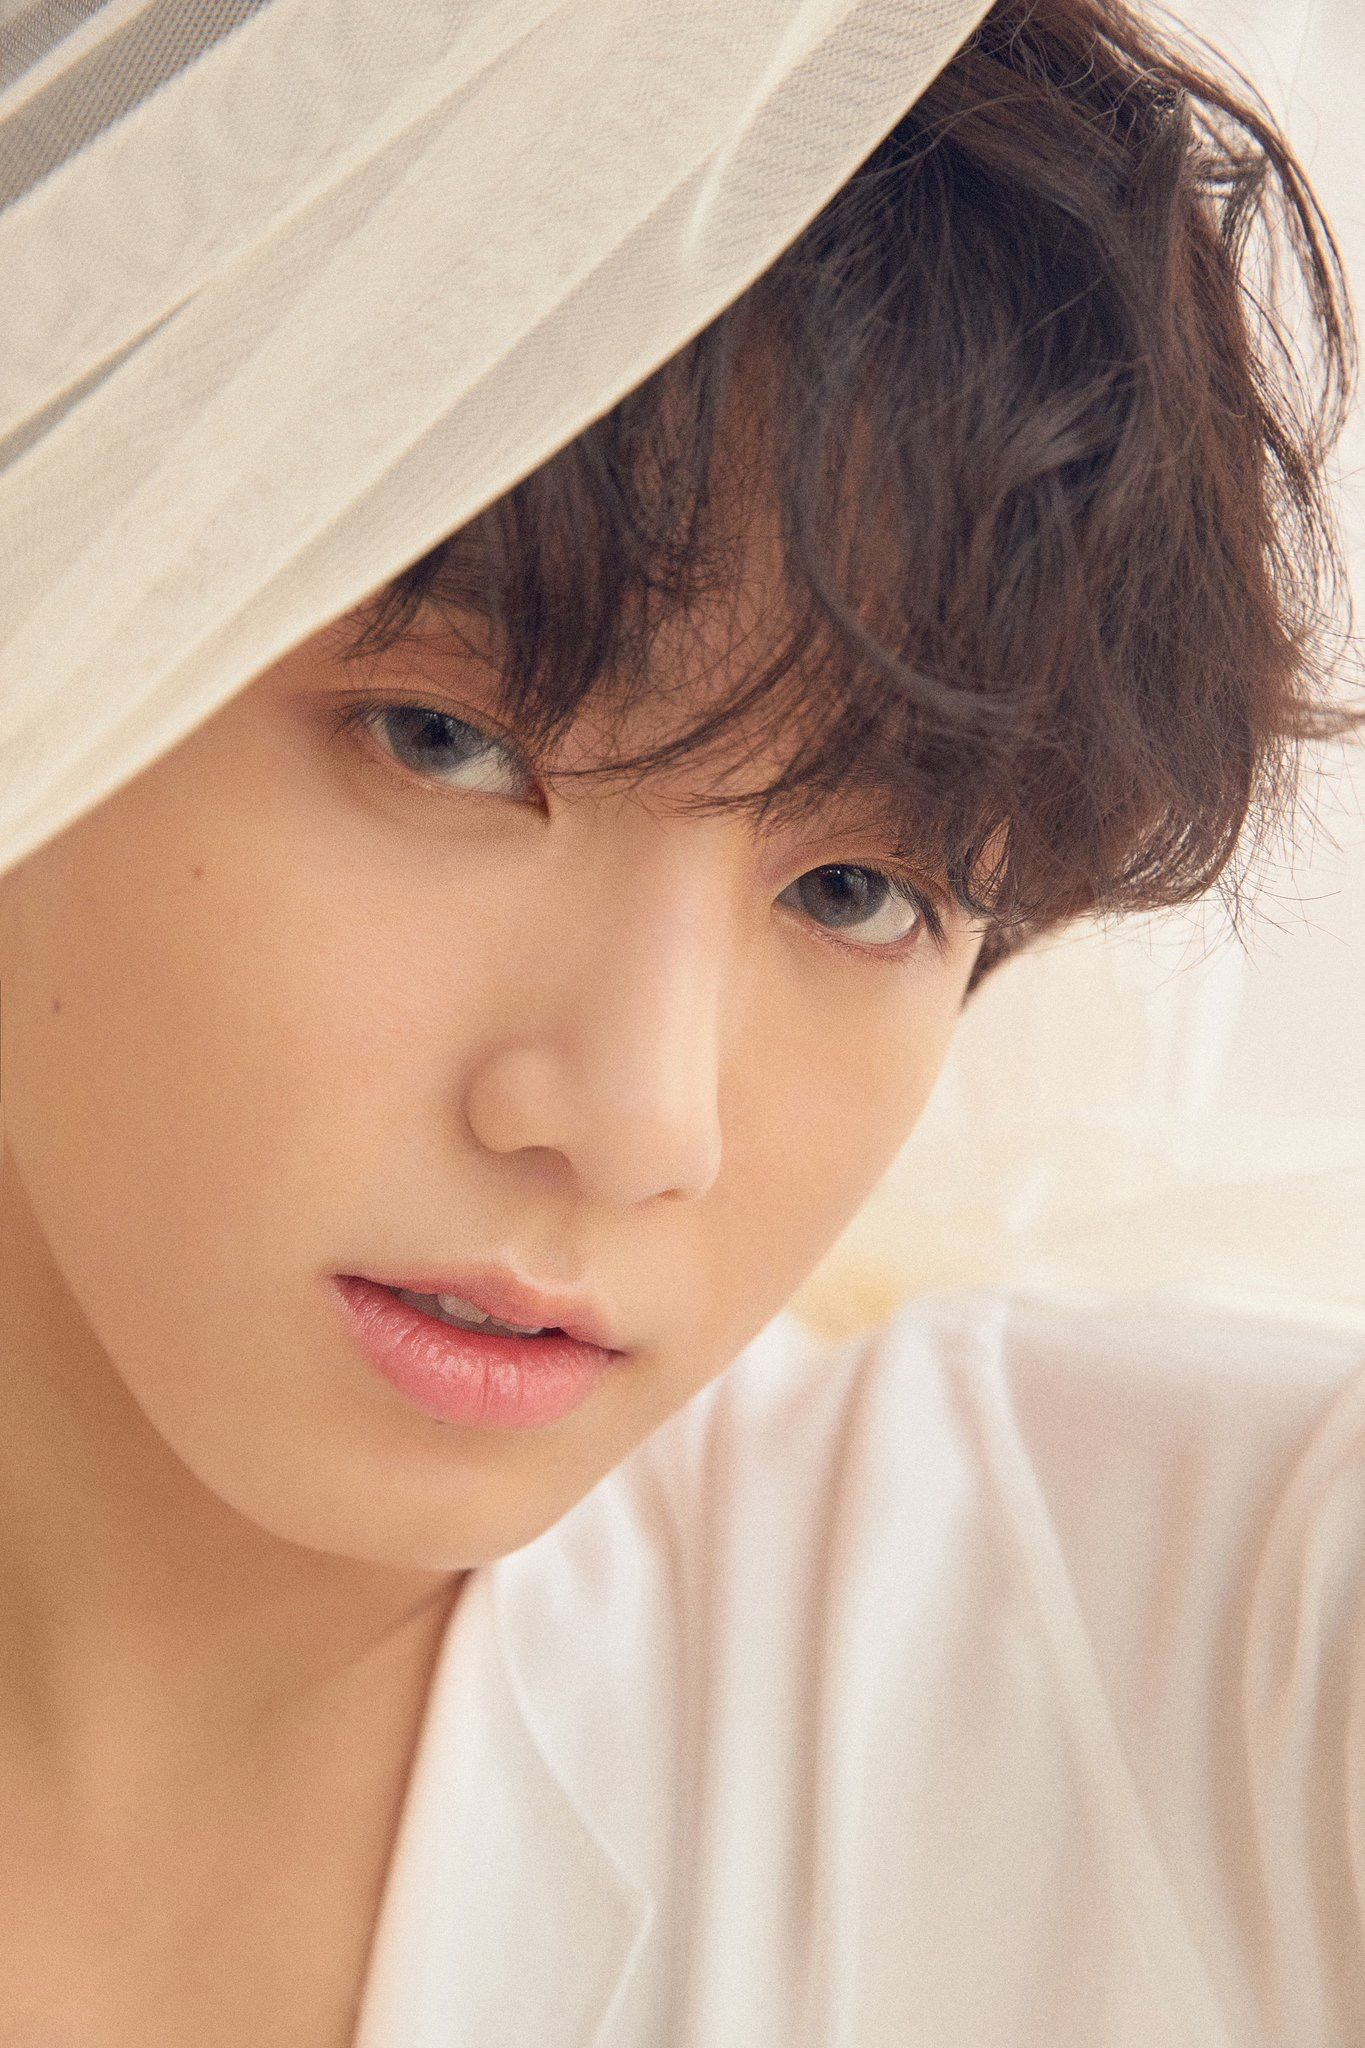 Bts Love Yourself Tear U Version Jeon Jungkook Bts